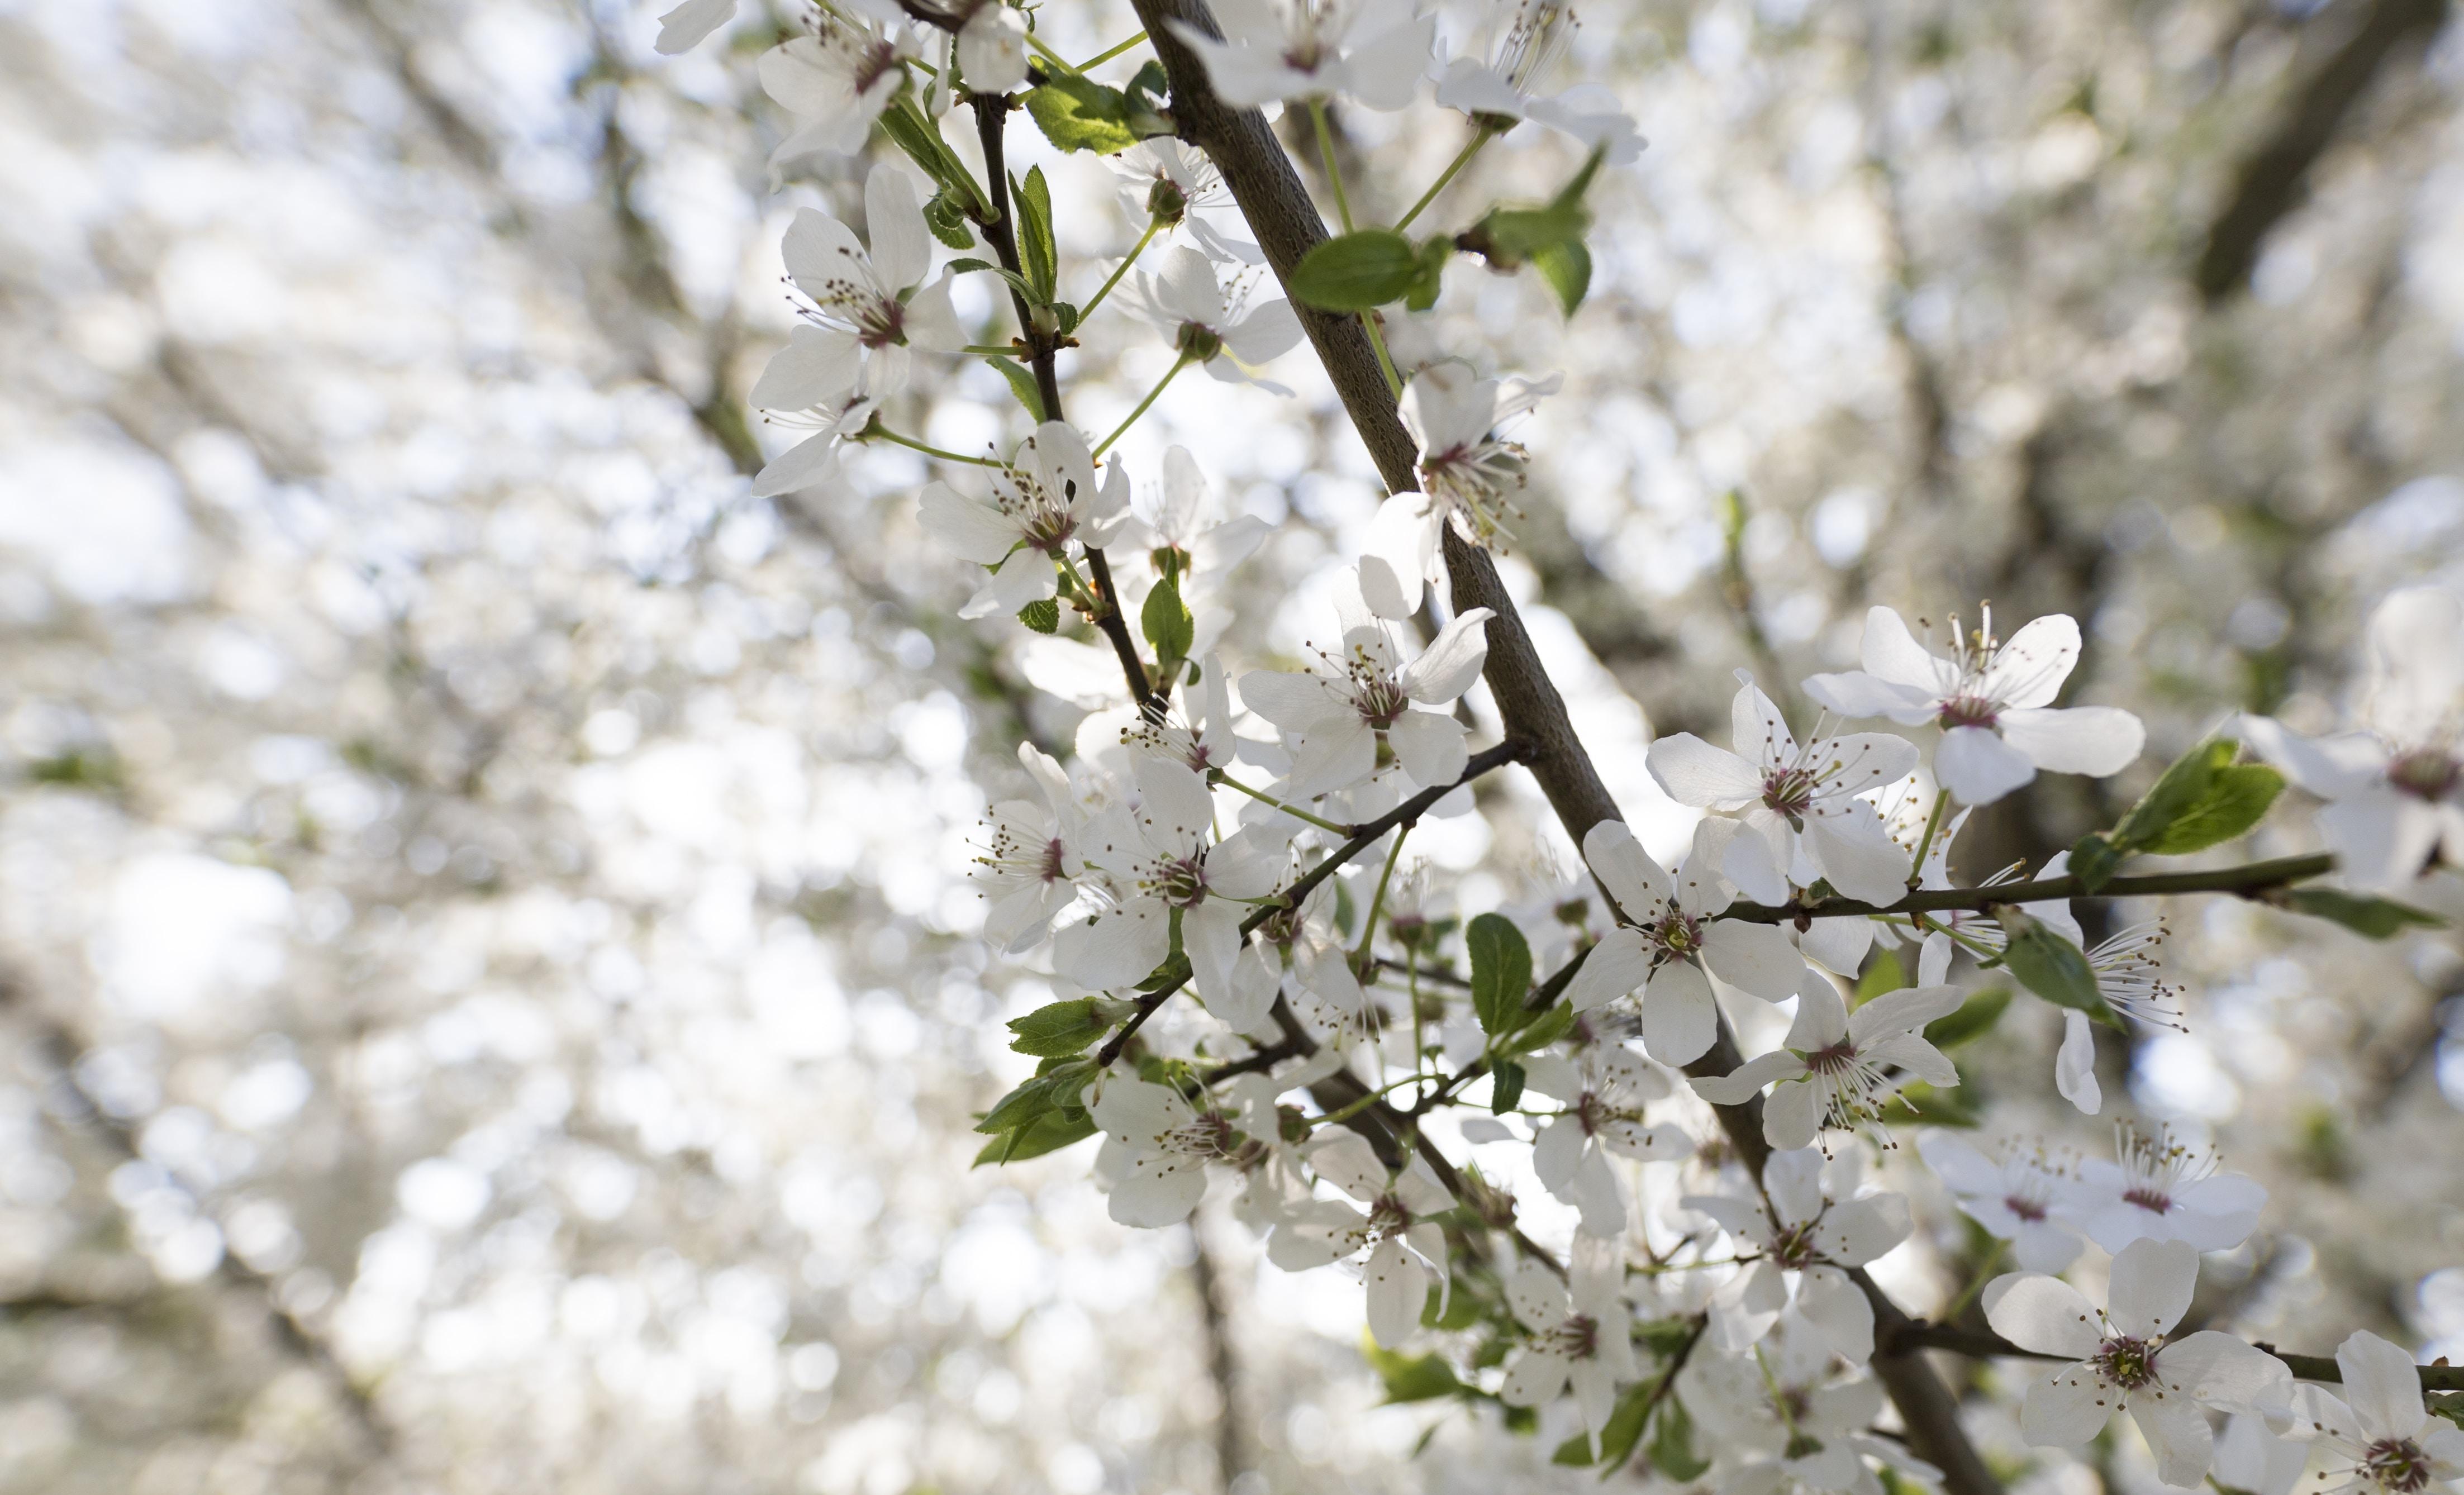 white flowers in tree branch in tilt shift photography